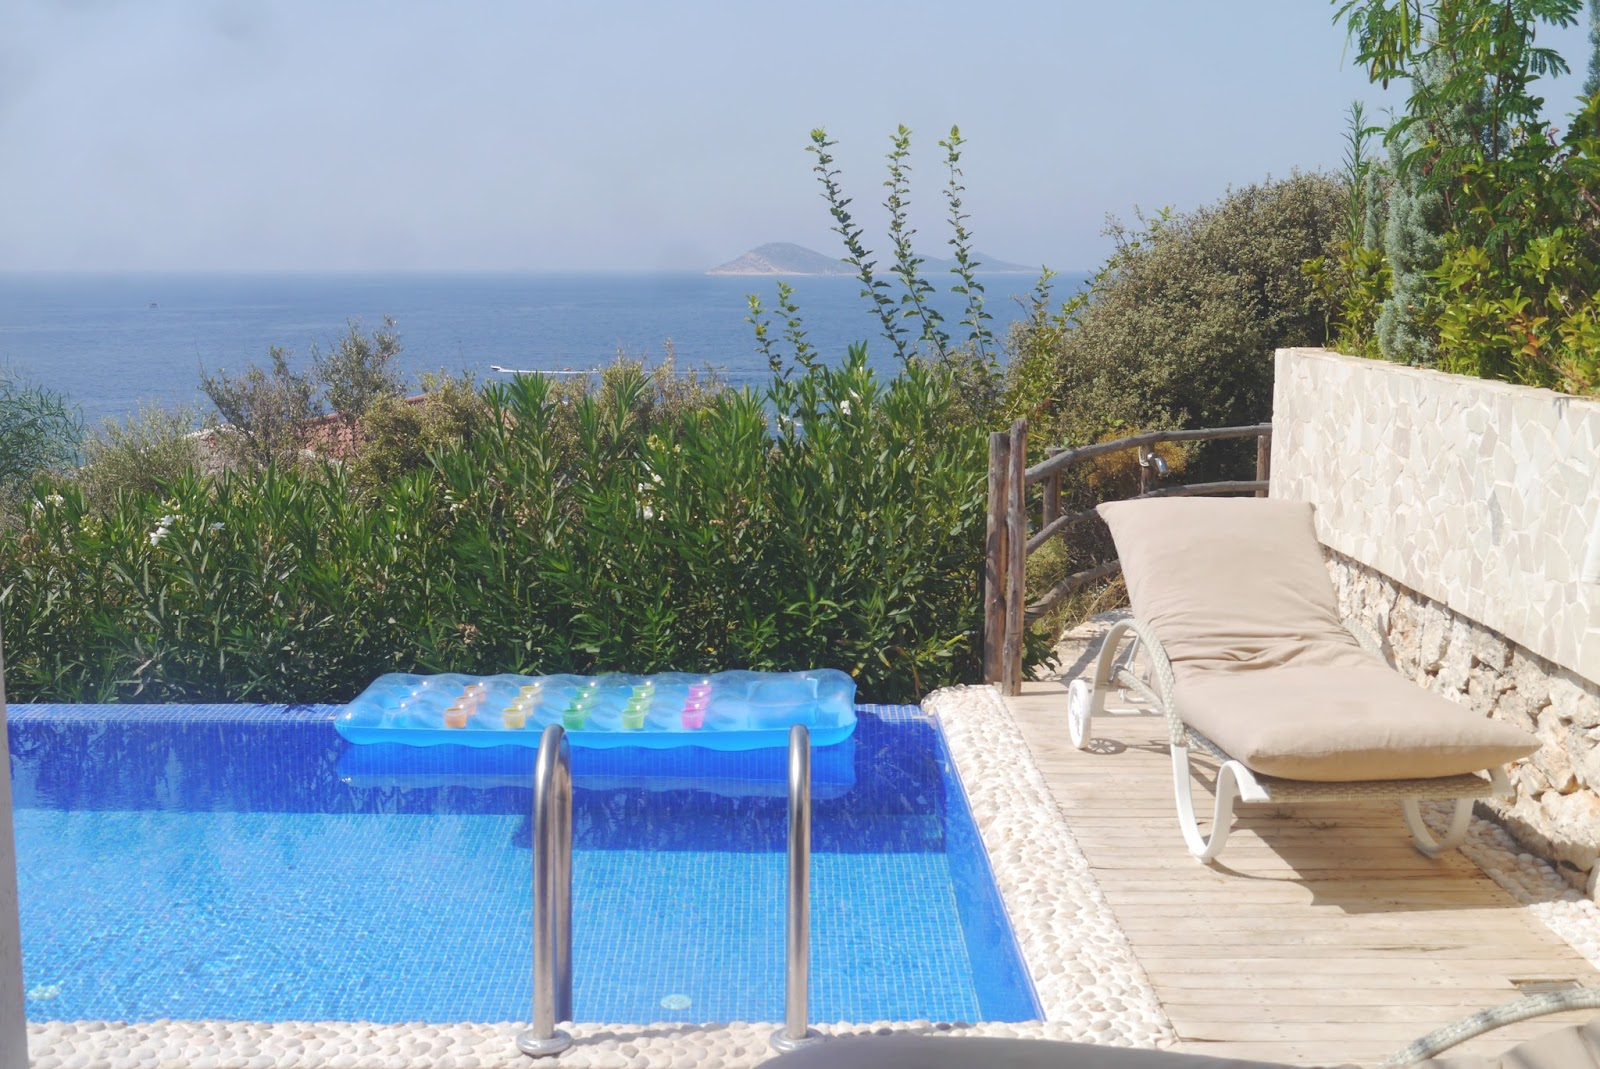 Review of Likya Pavillion Hotel in Kalkan, Turkey